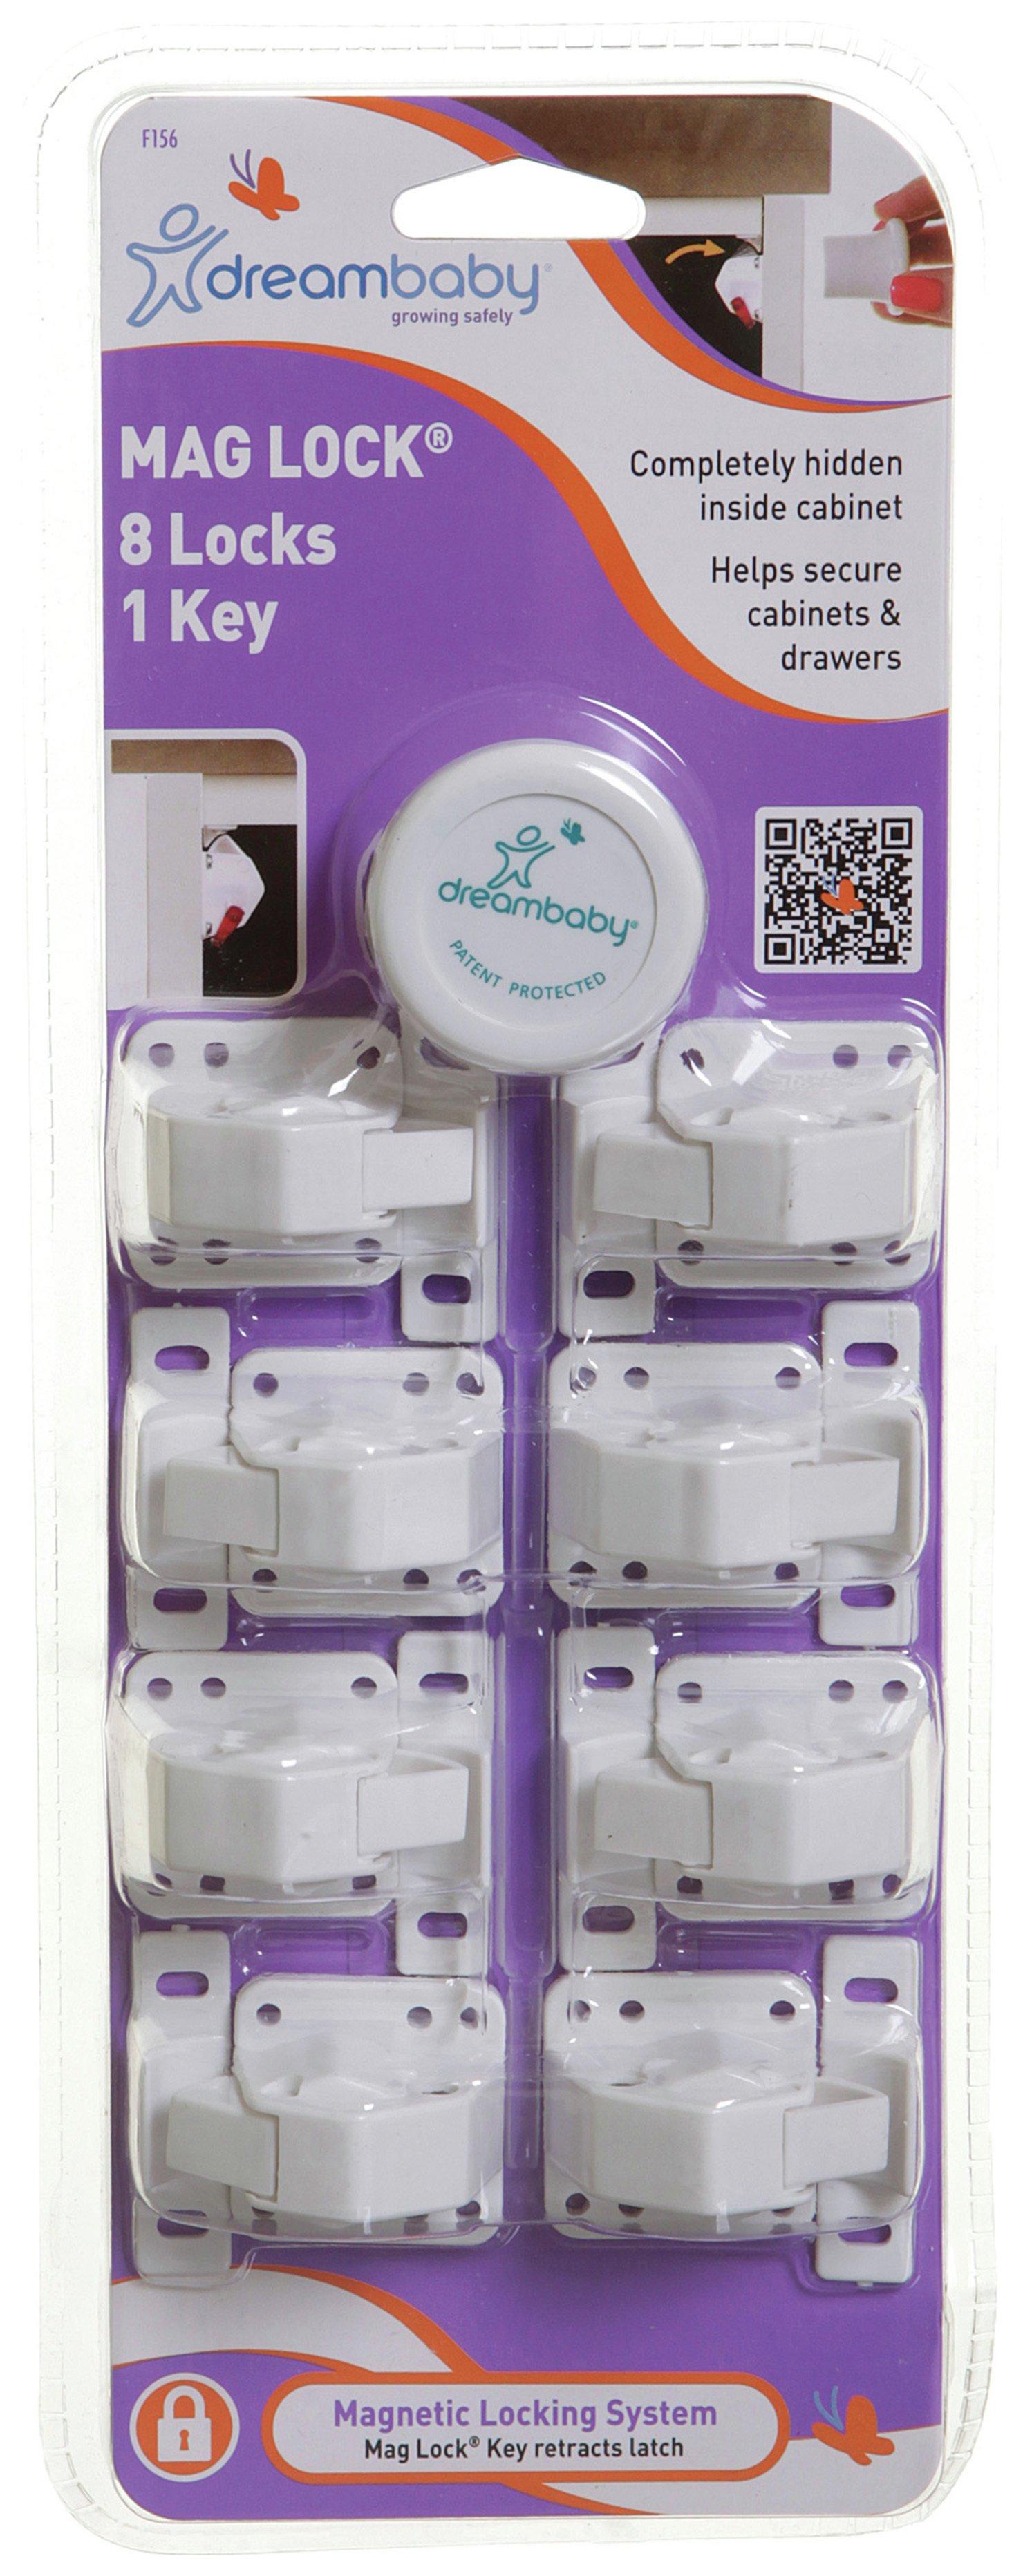 Dreambaby Classic Mag Lock - Set Of 8 Locks & 1 Key.